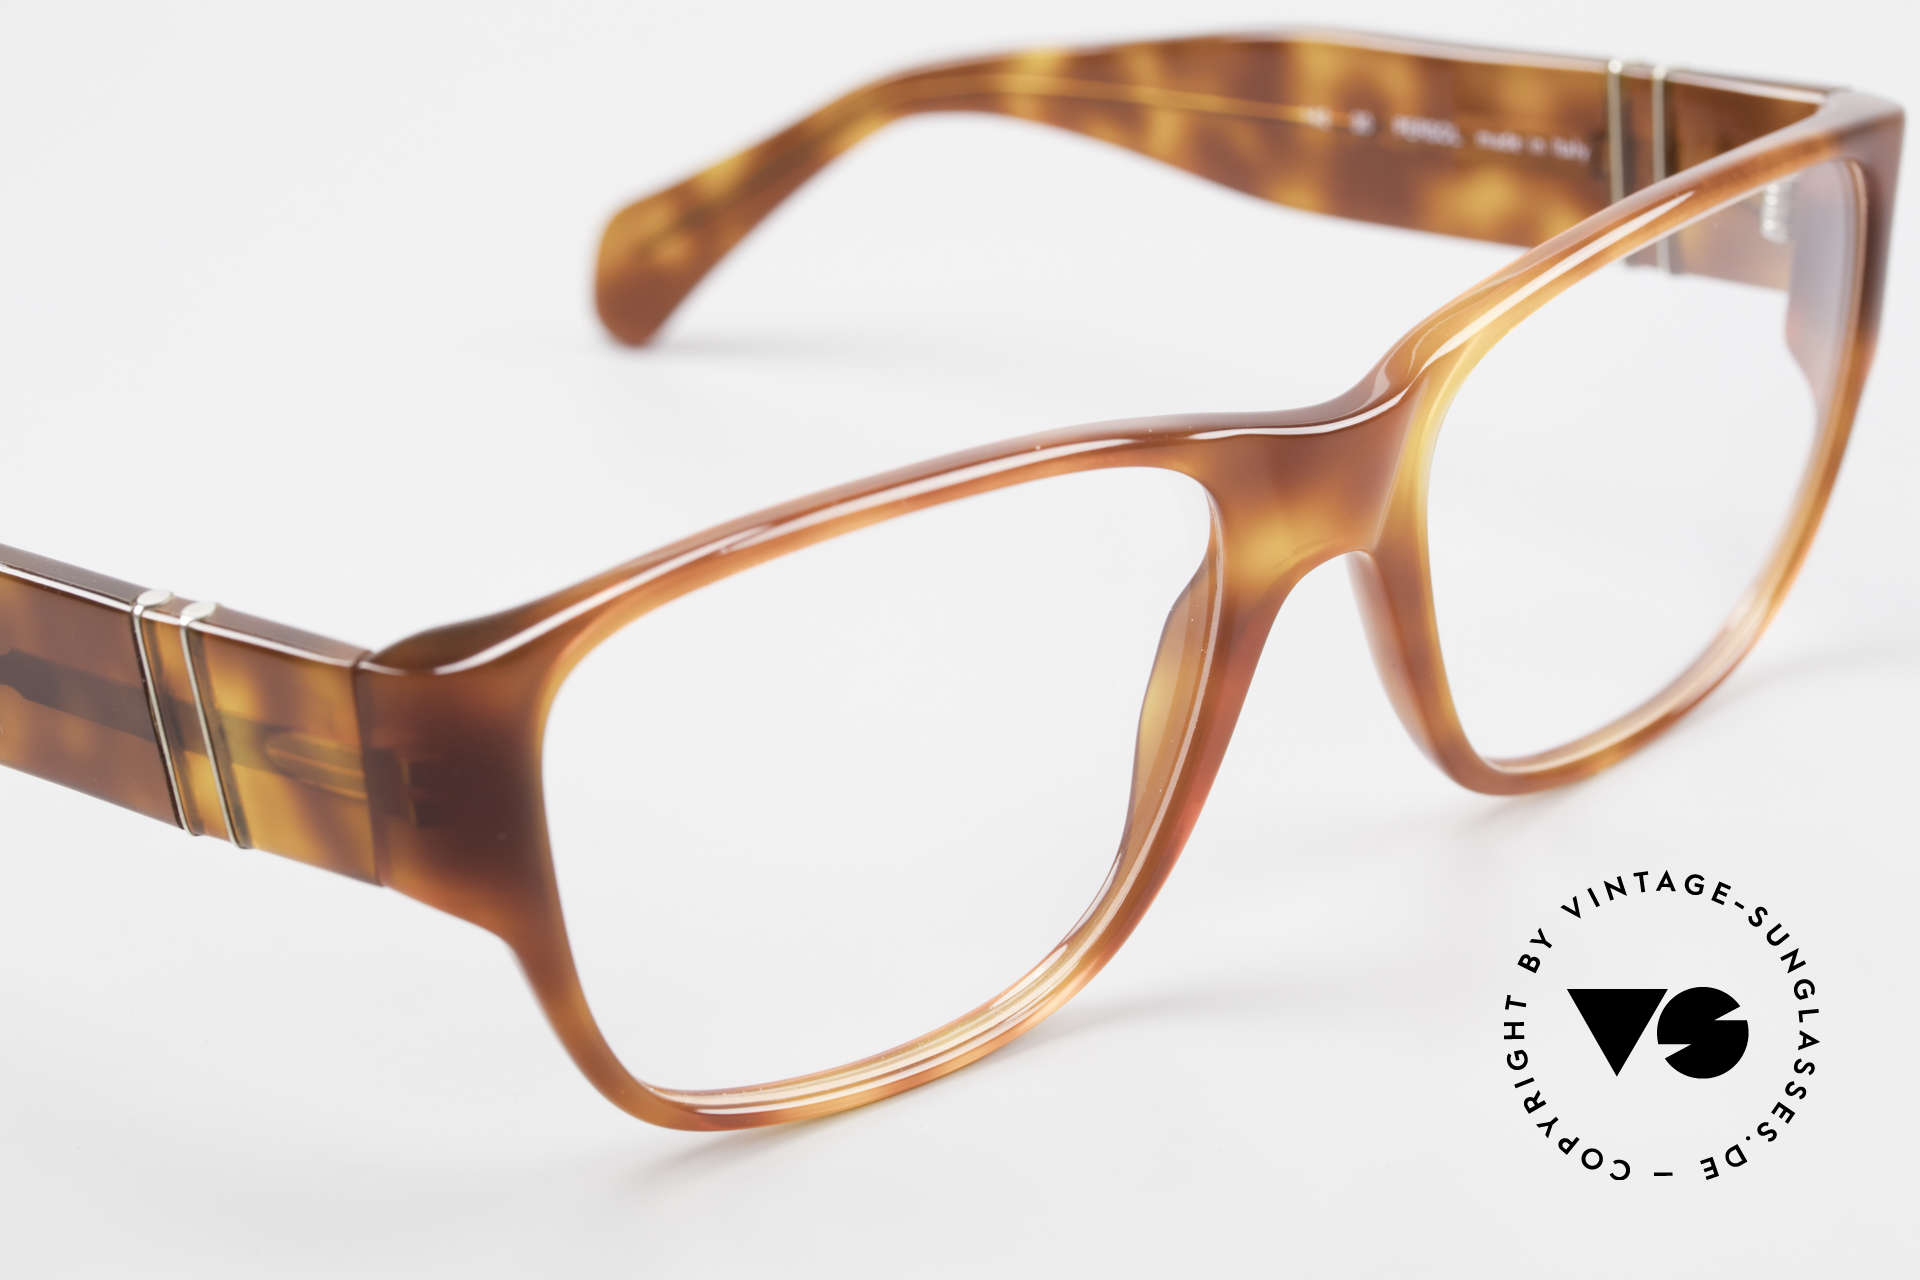 Persol 856 Striking Men's Vintage Frame, frame can be glazed with optical (sun) lenses, Made for Men